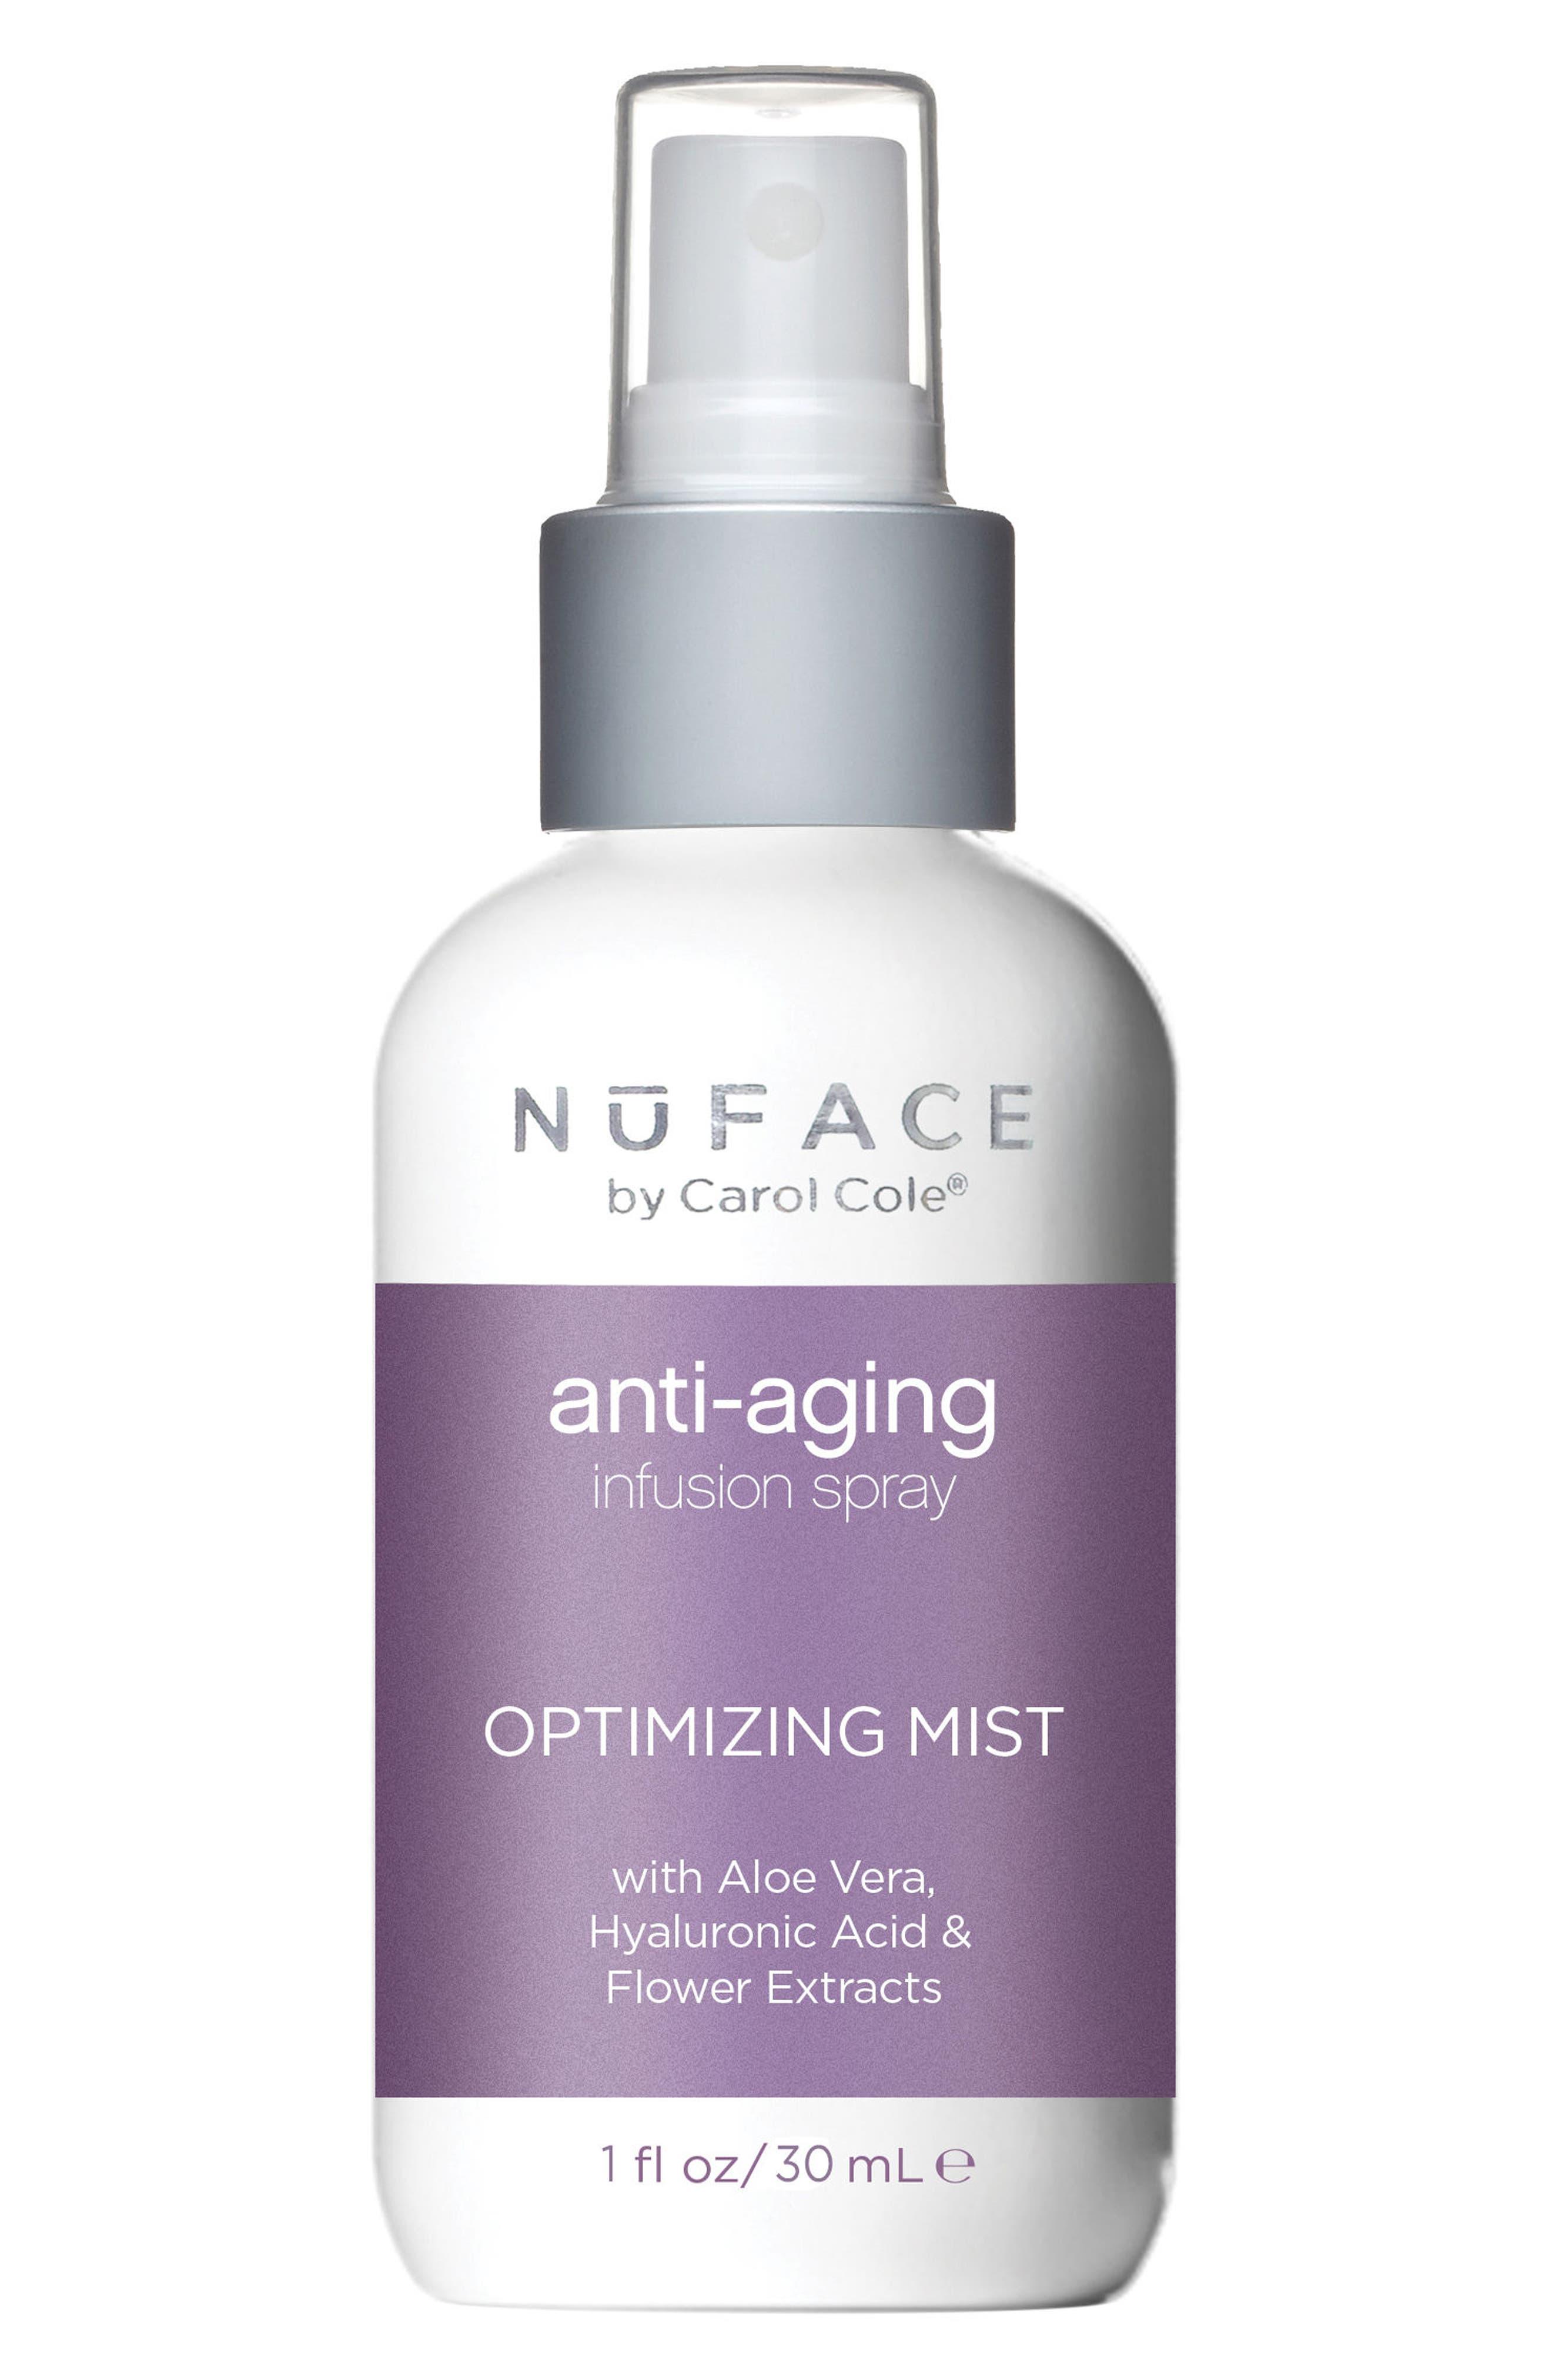 NuFACE® Optimizing Mist